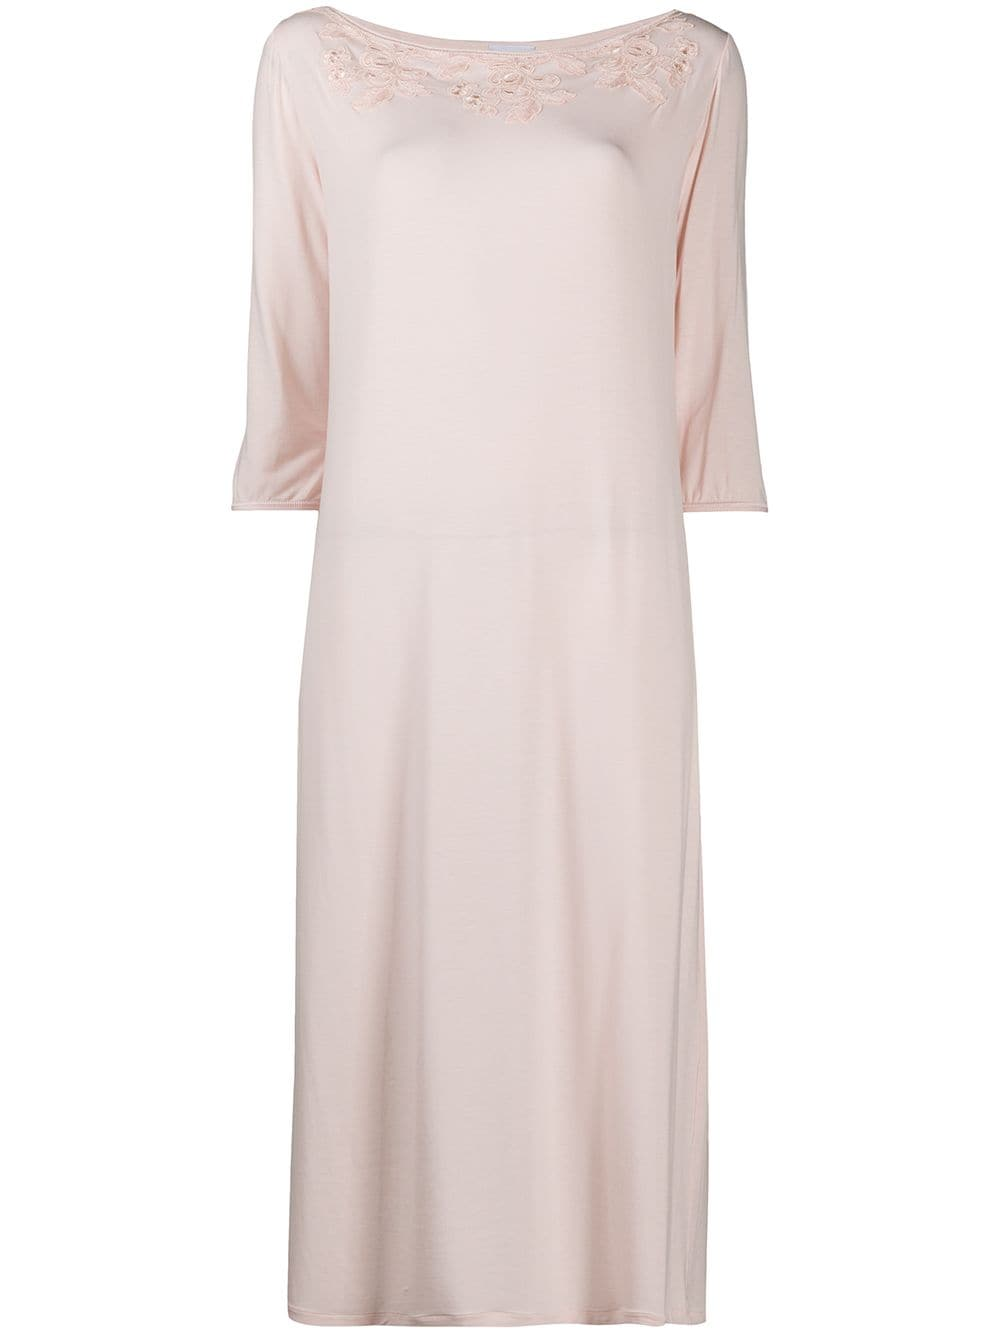 Maison Contouring Short Nightgown